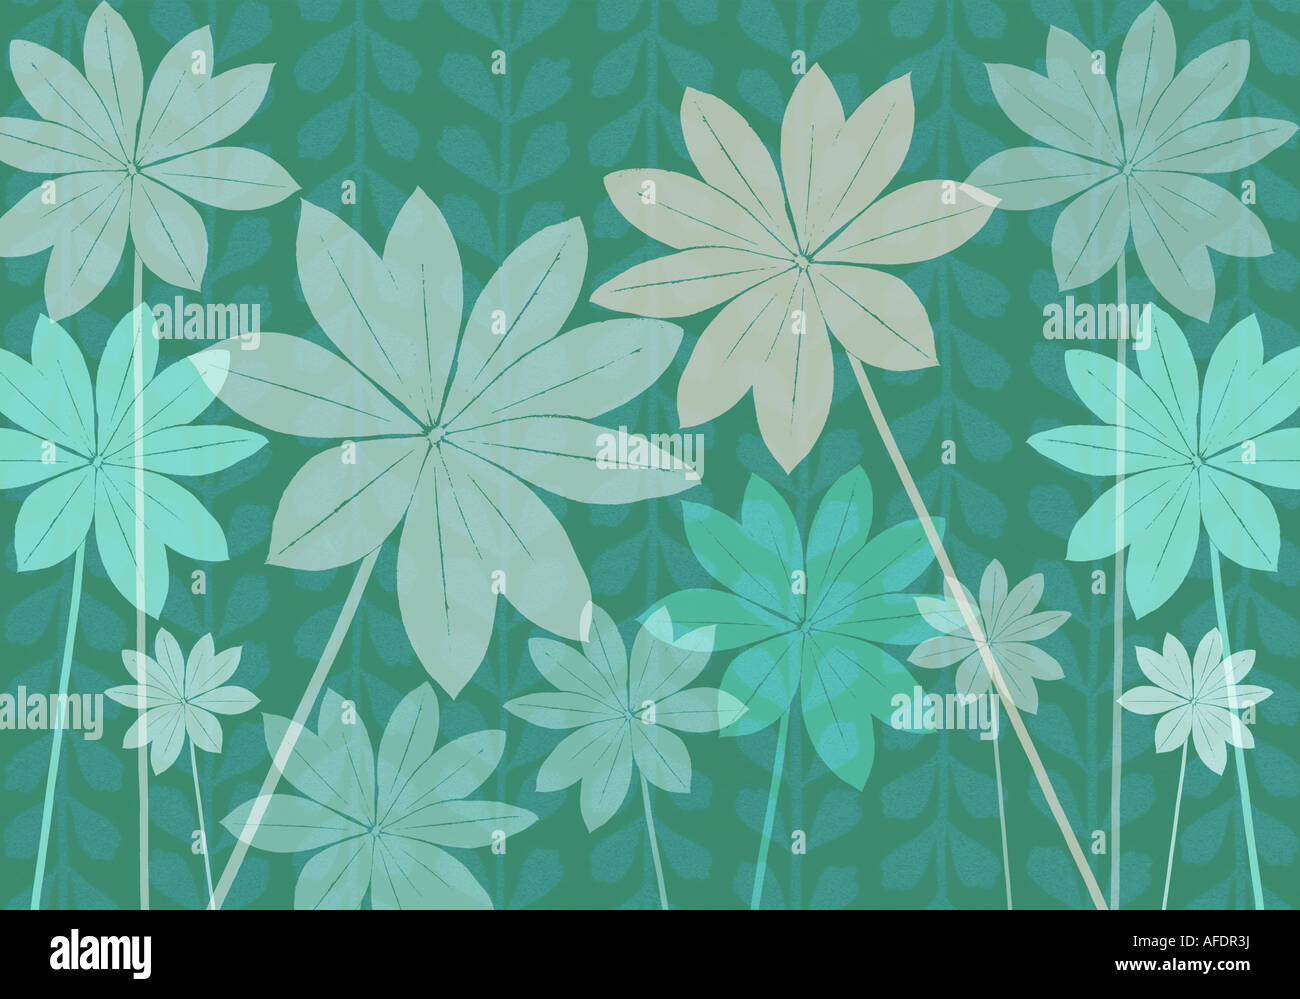 Illustration of lupin foliage - Stock Image